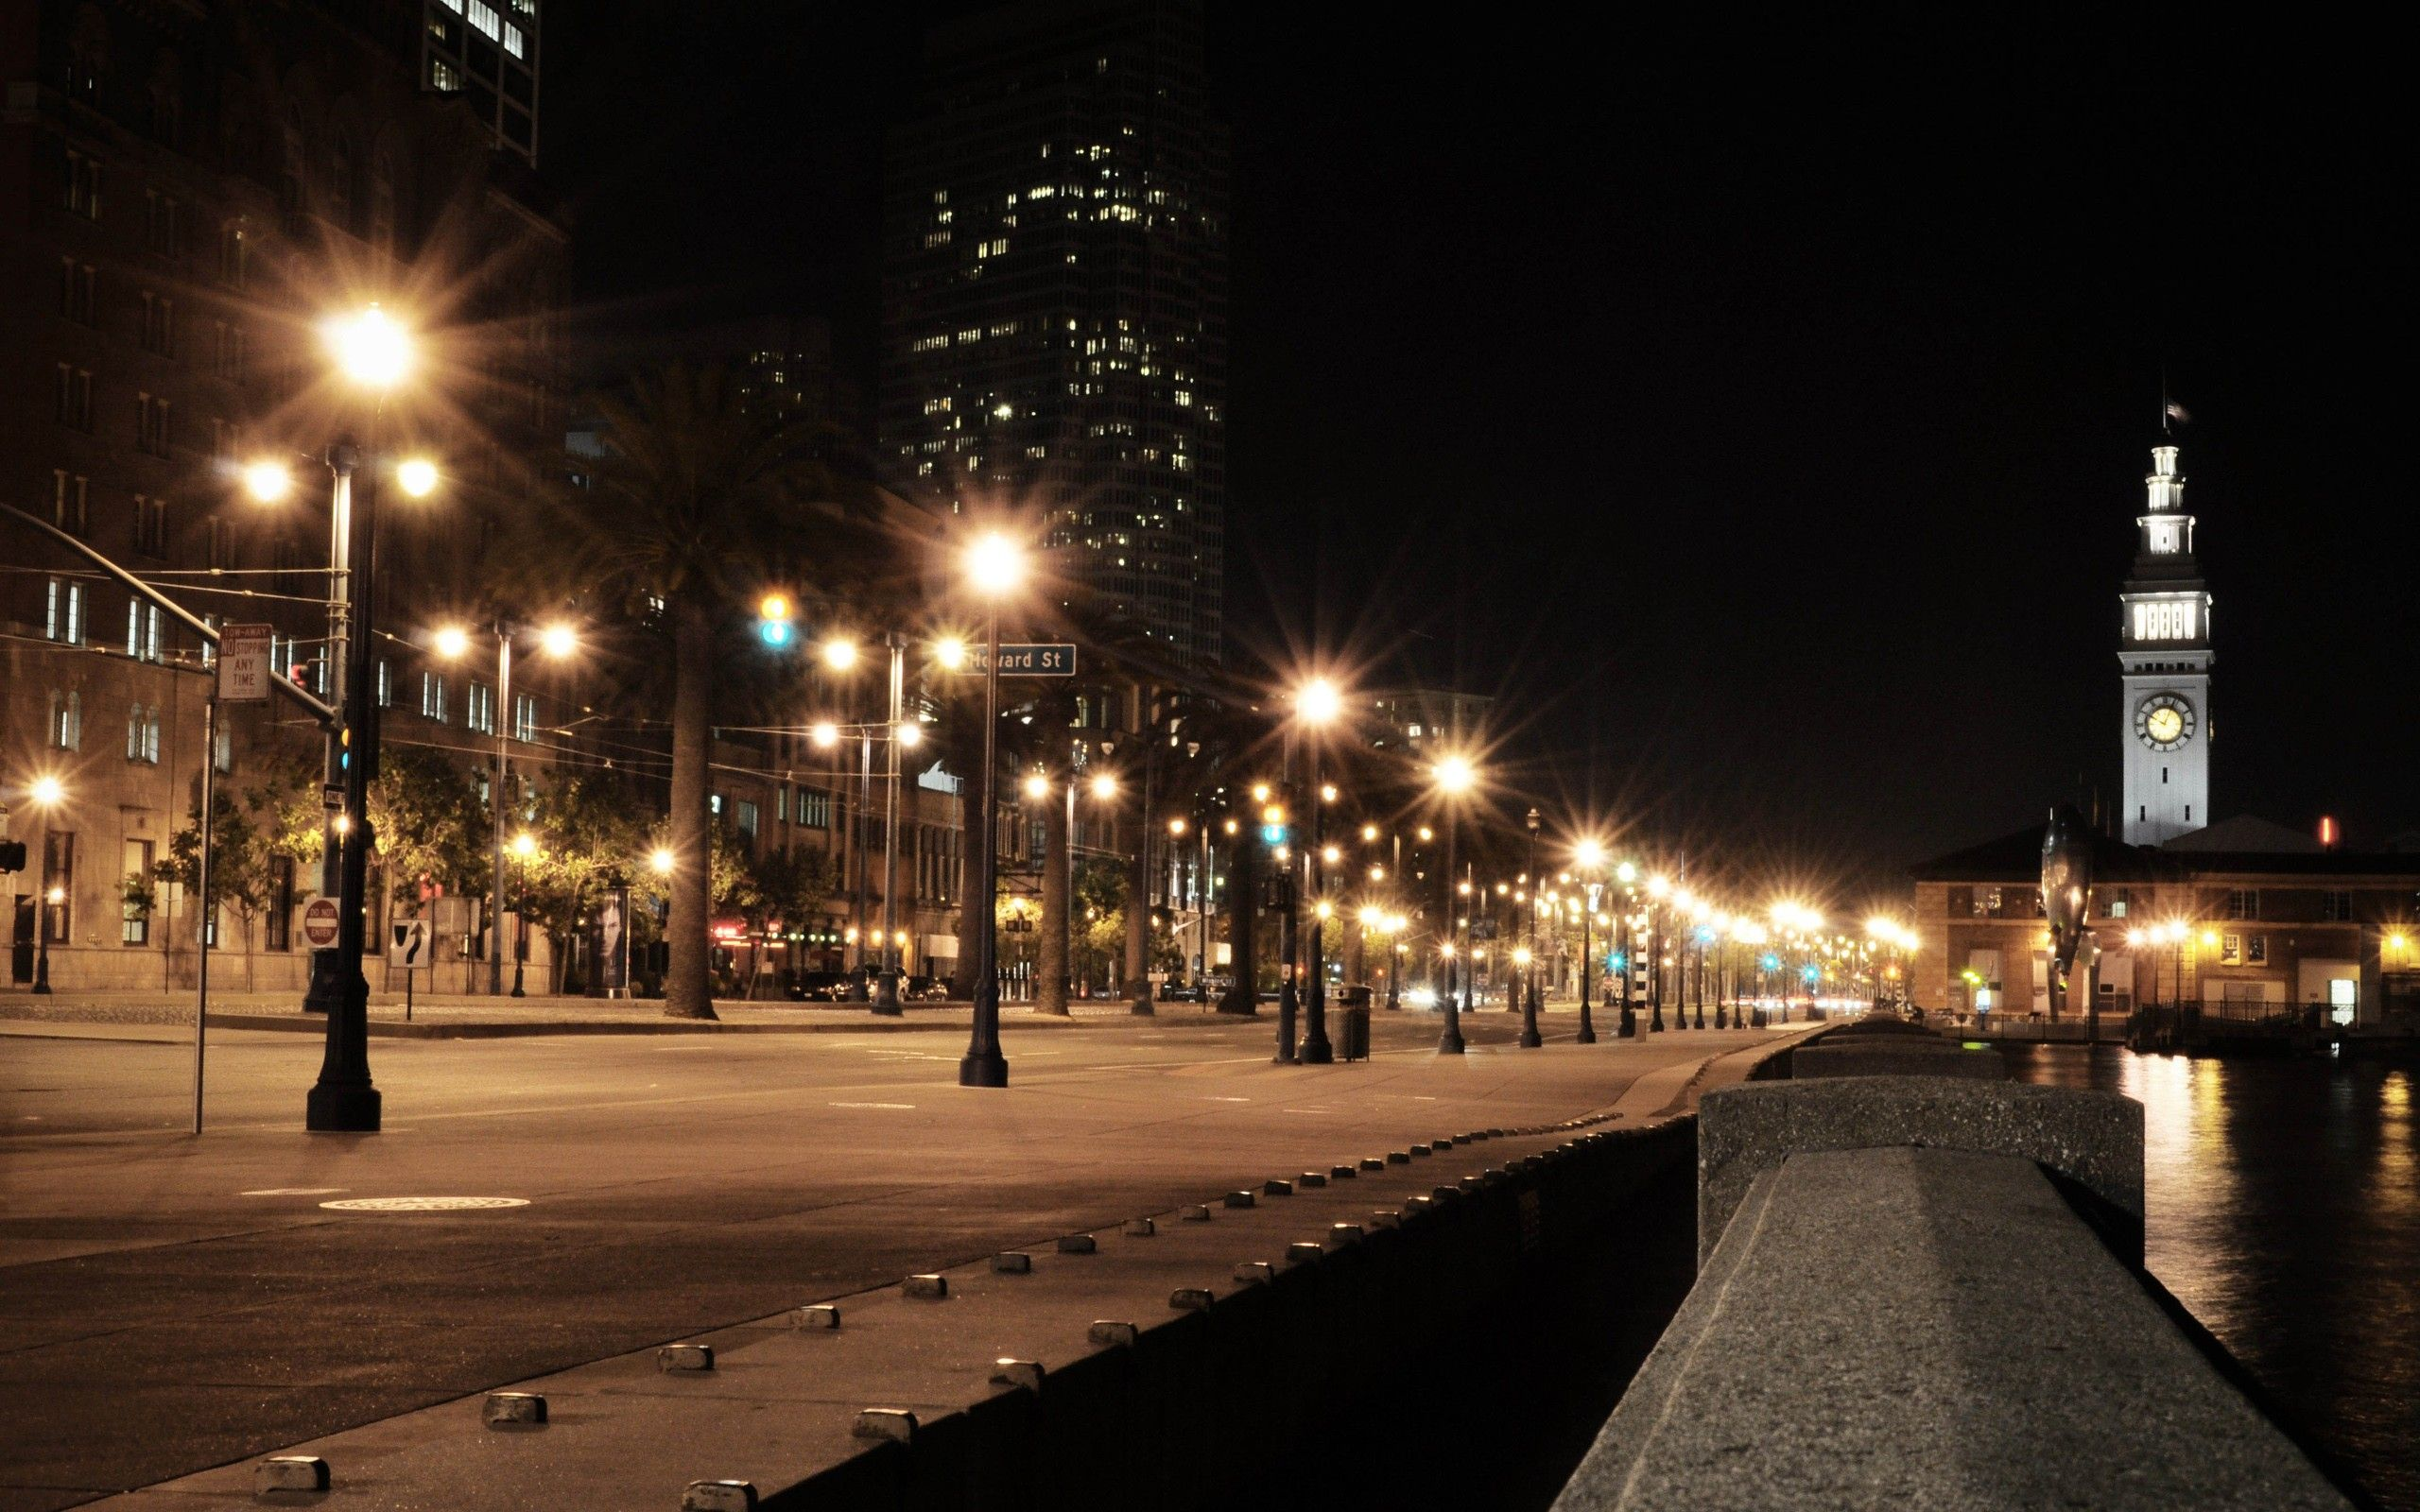 Street Lights at Night | Buildings, Street, Night, Lights wallpapers ... for Street Lights At Night Hd  113cpg